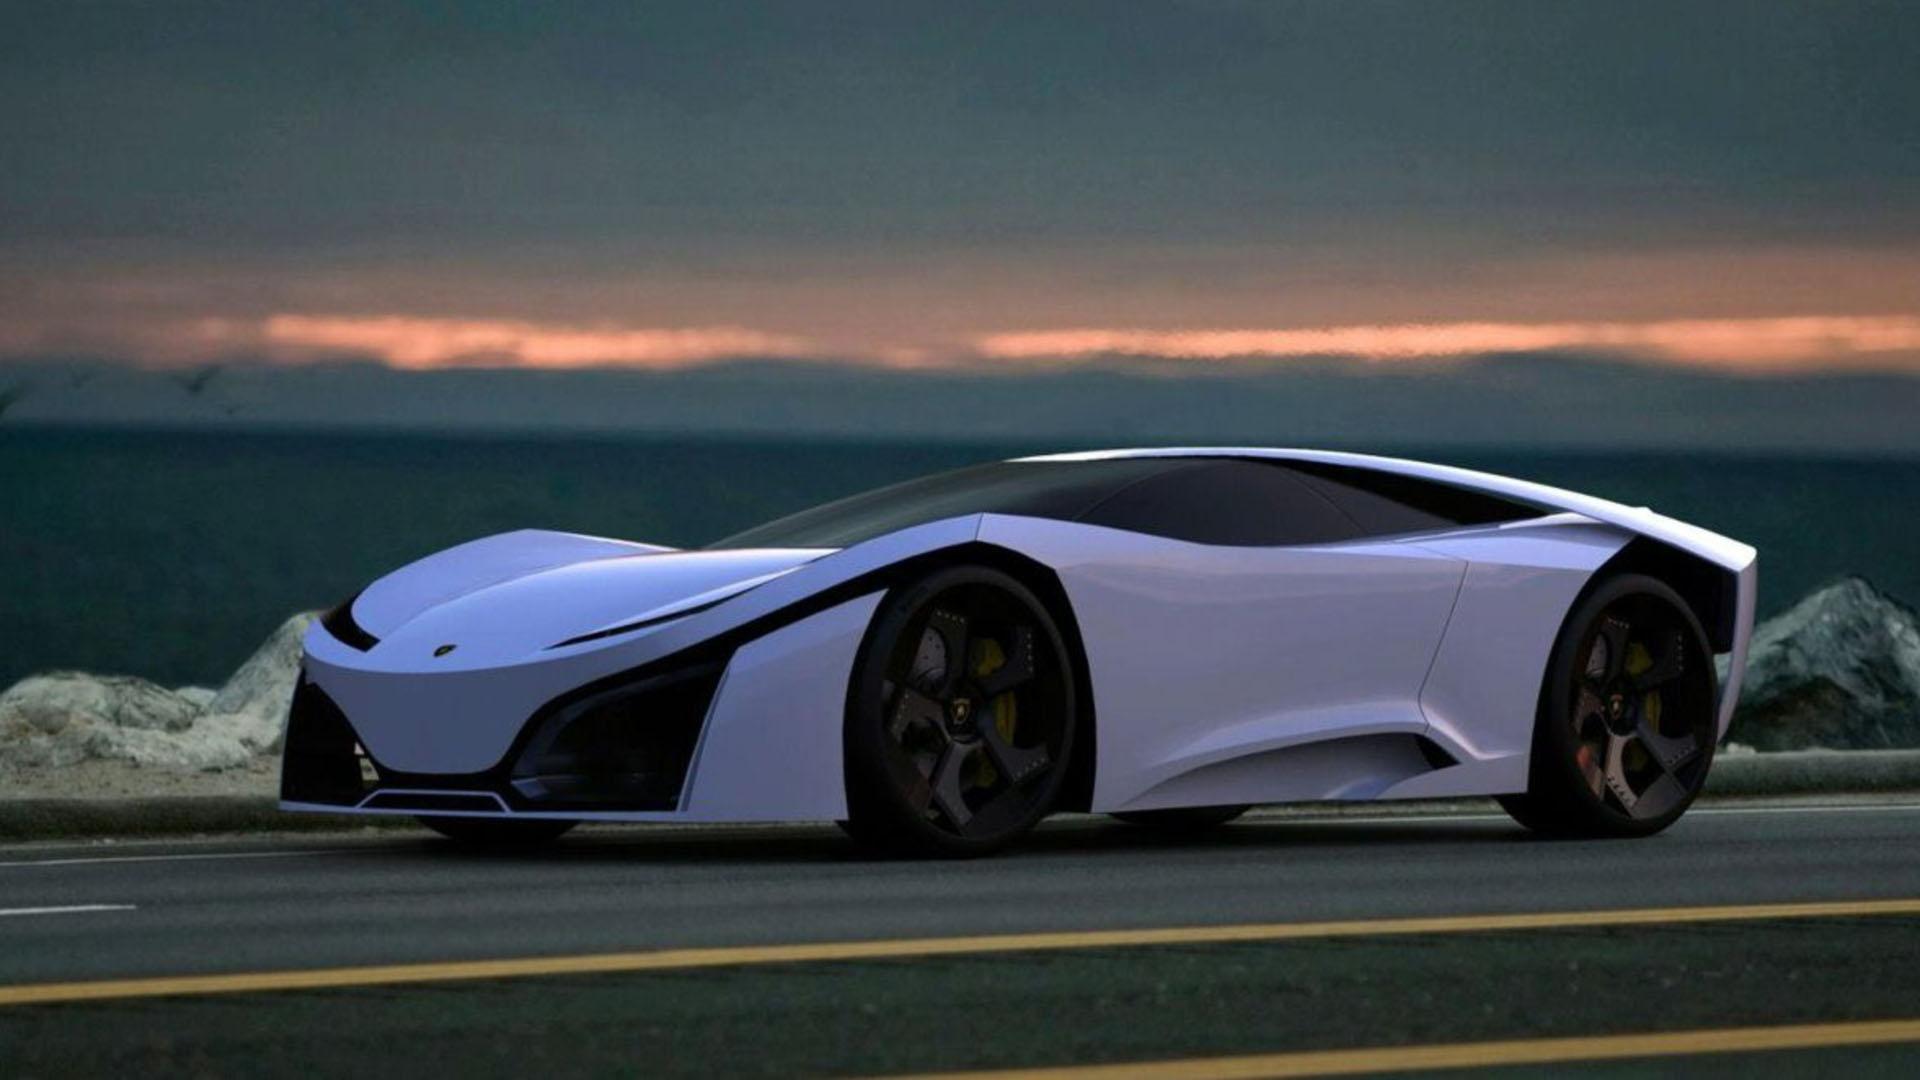 Lamborghini Cars Wallpapers WallpaperSafari - Cool lamborghini cars